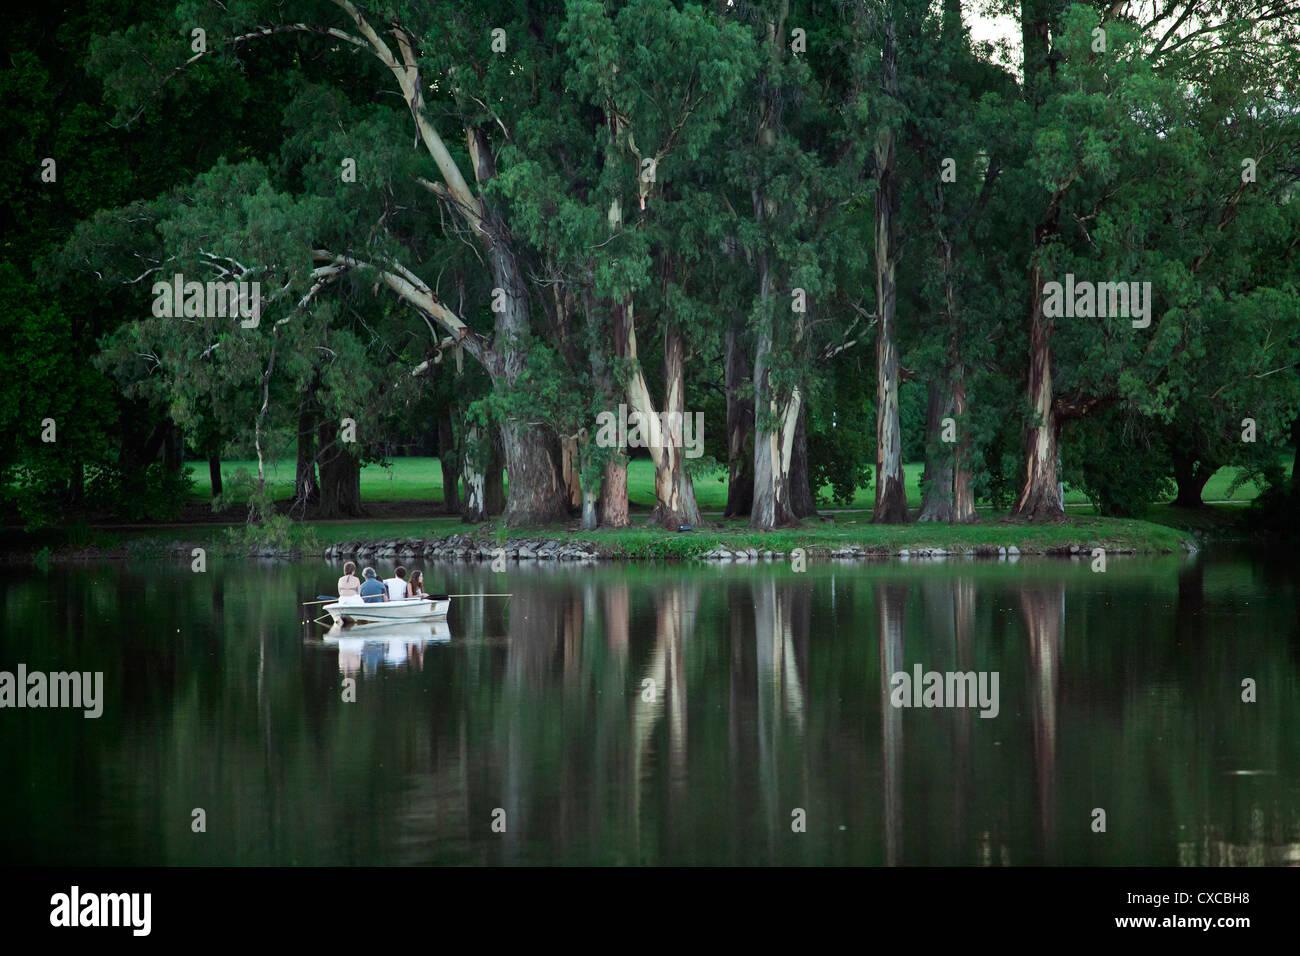 People fishing at a lake in estancia La Paz, Cordoba Province, Argentina. - Stock Image